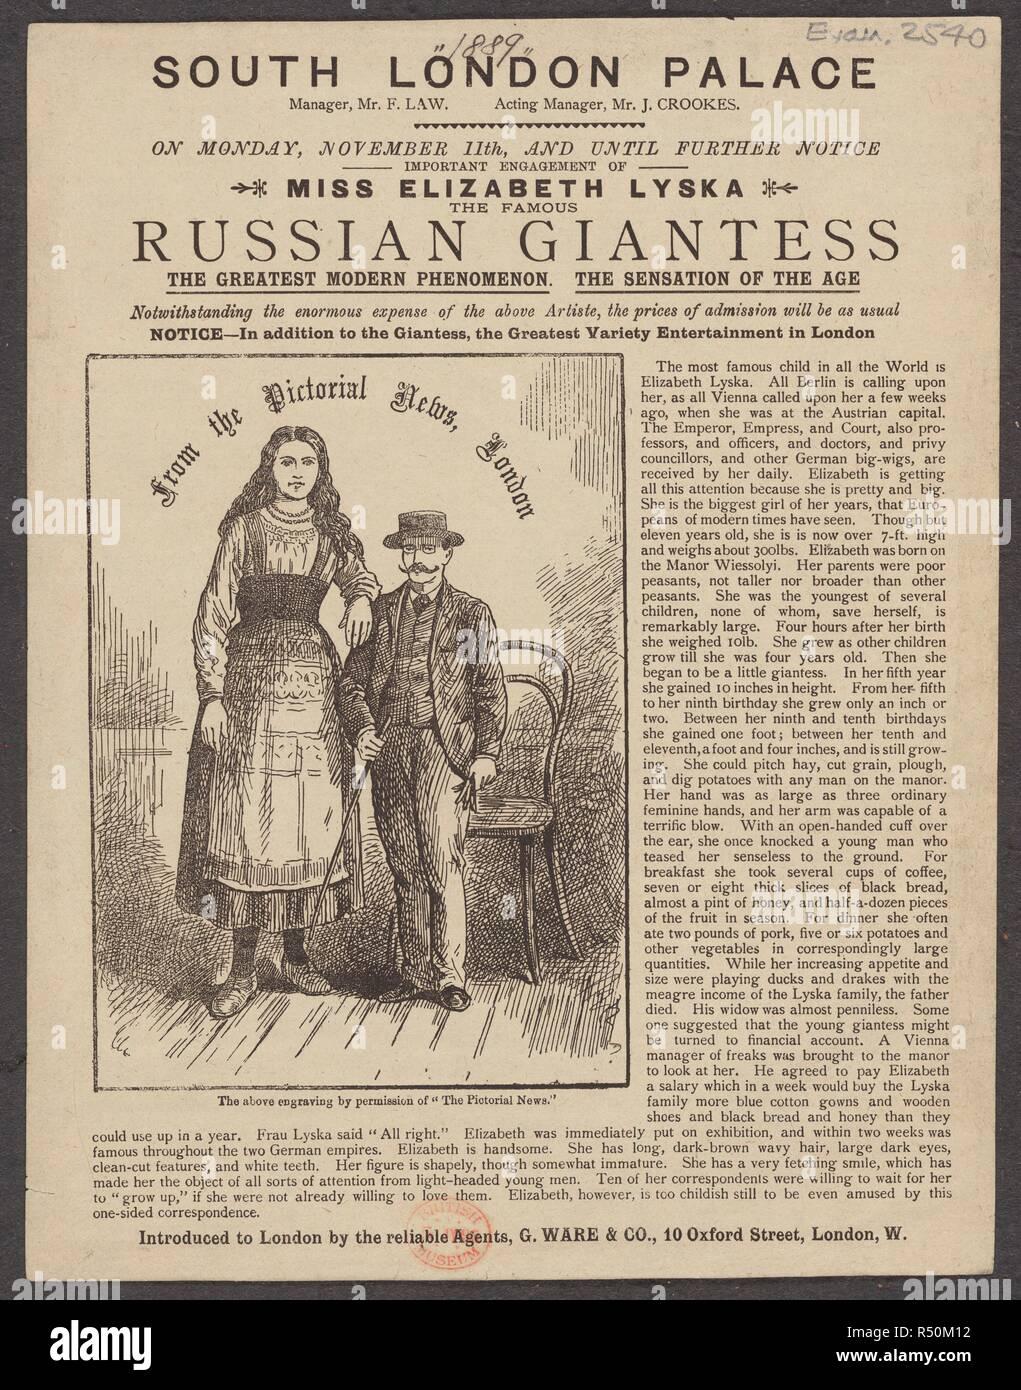 Rusian Giantess